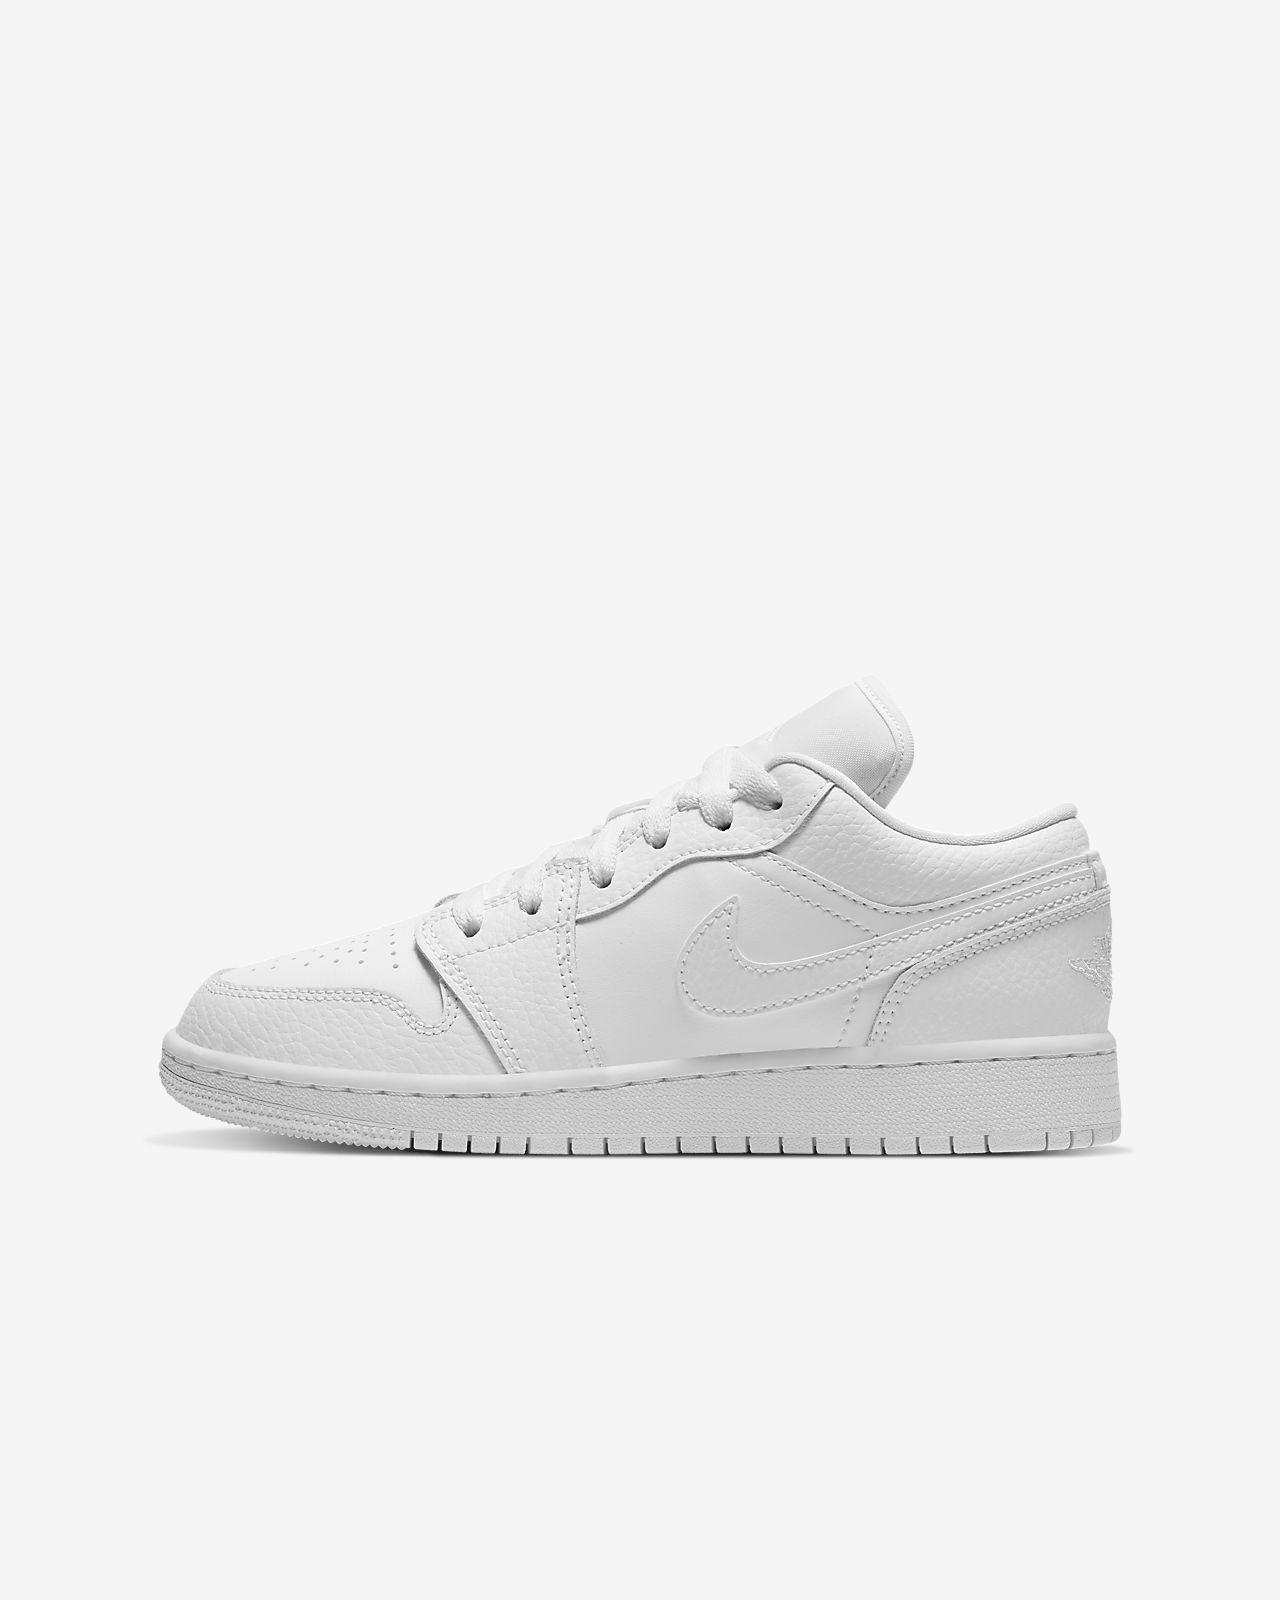 Air Jordan 1 Low(GS)大童运动童鞋